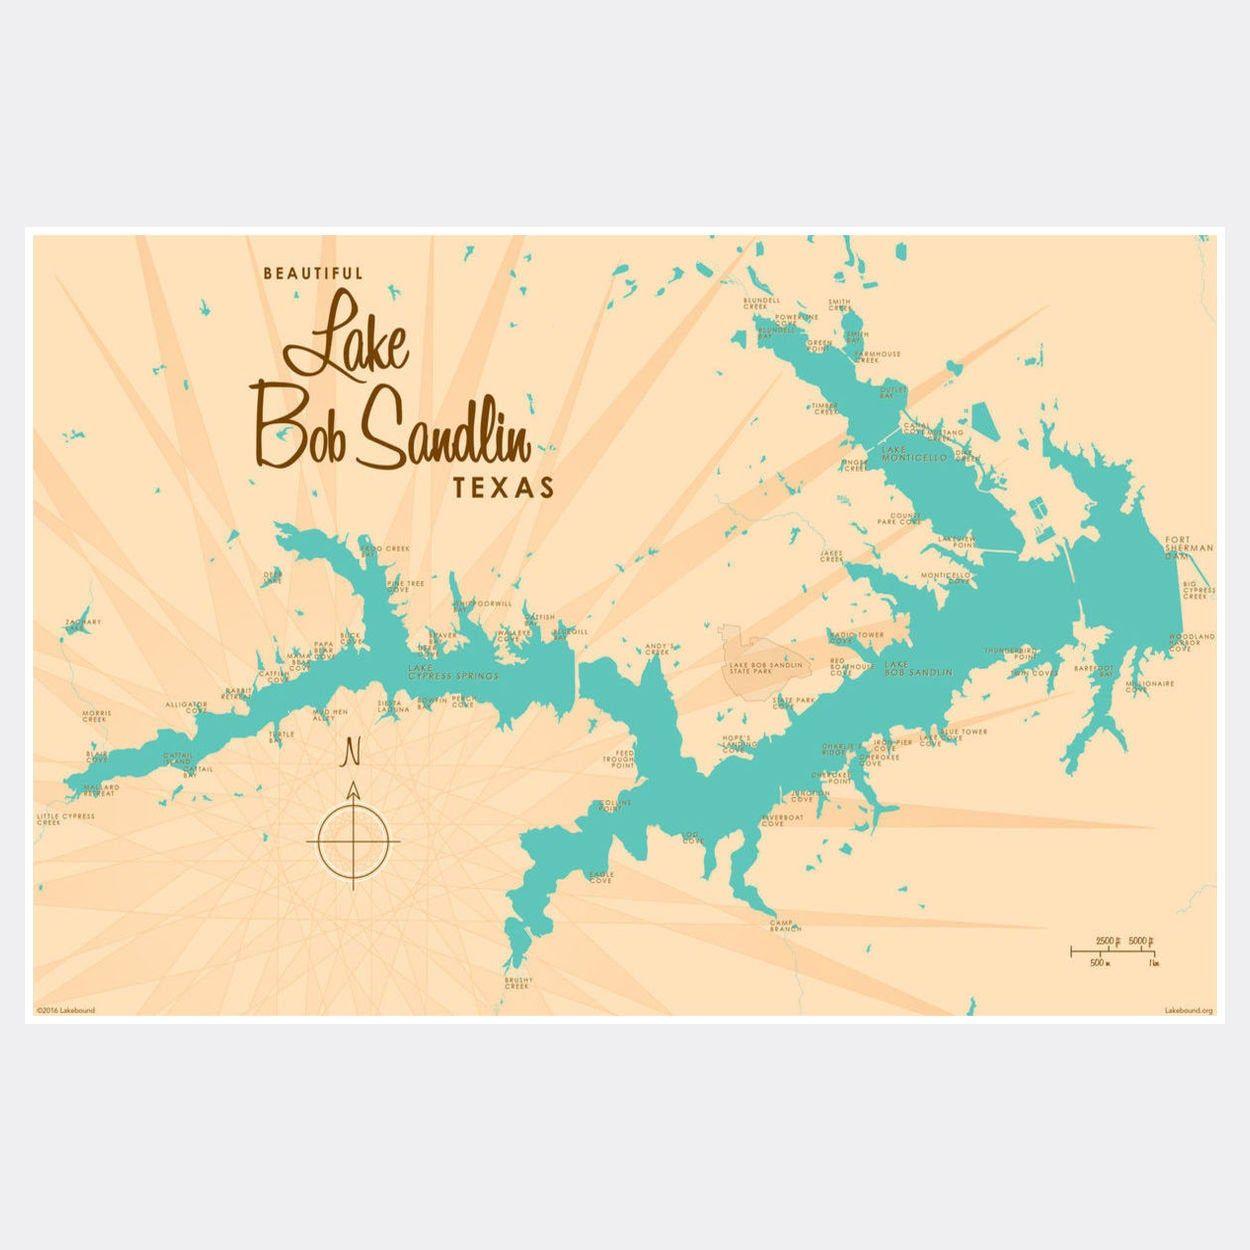 lake bob sandlin map Lake Bob Sandlin Texas Paper Print Map Art Map Art Map Art lake bob sandlin map